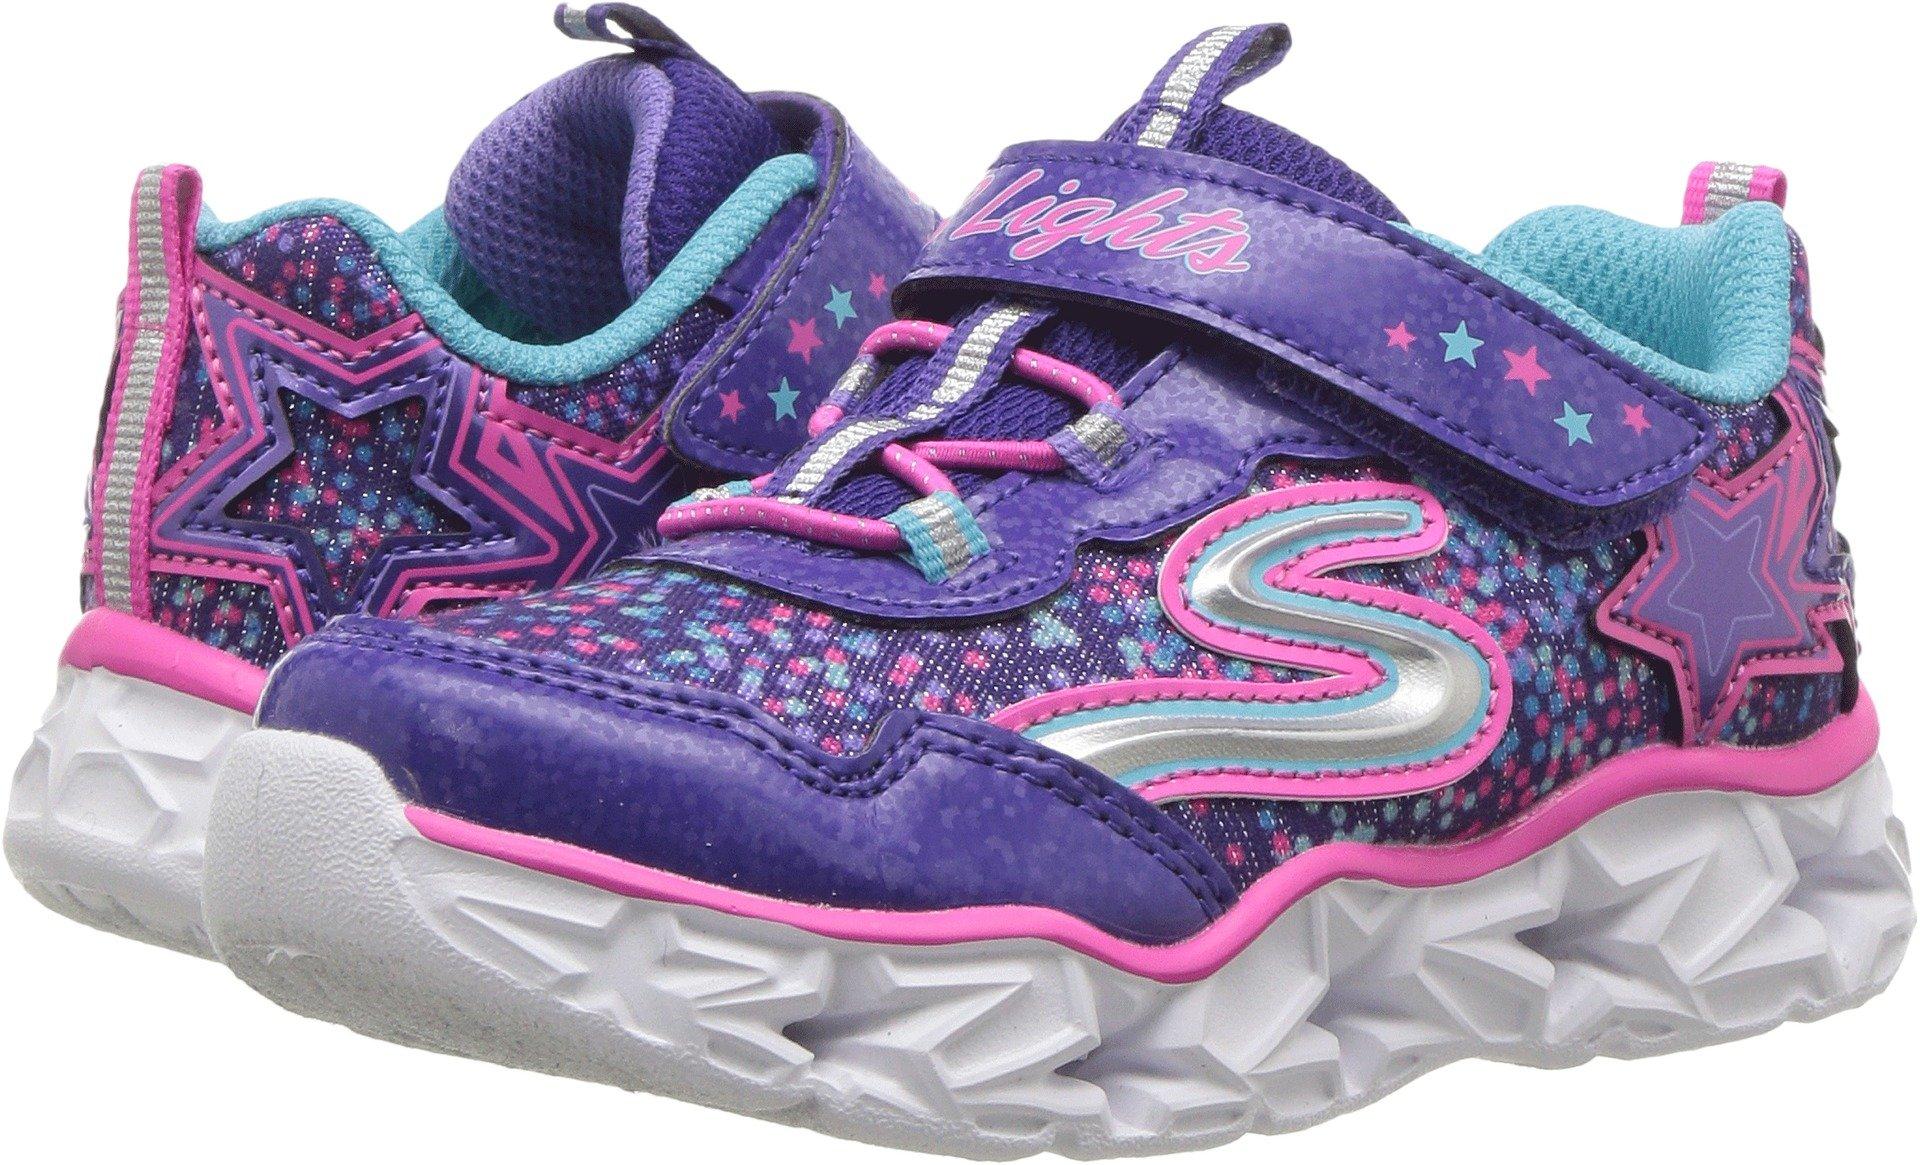 Skechers Kids' Galaxy Lights Sneaker,Purple/Multi,10 Medium US Toddler